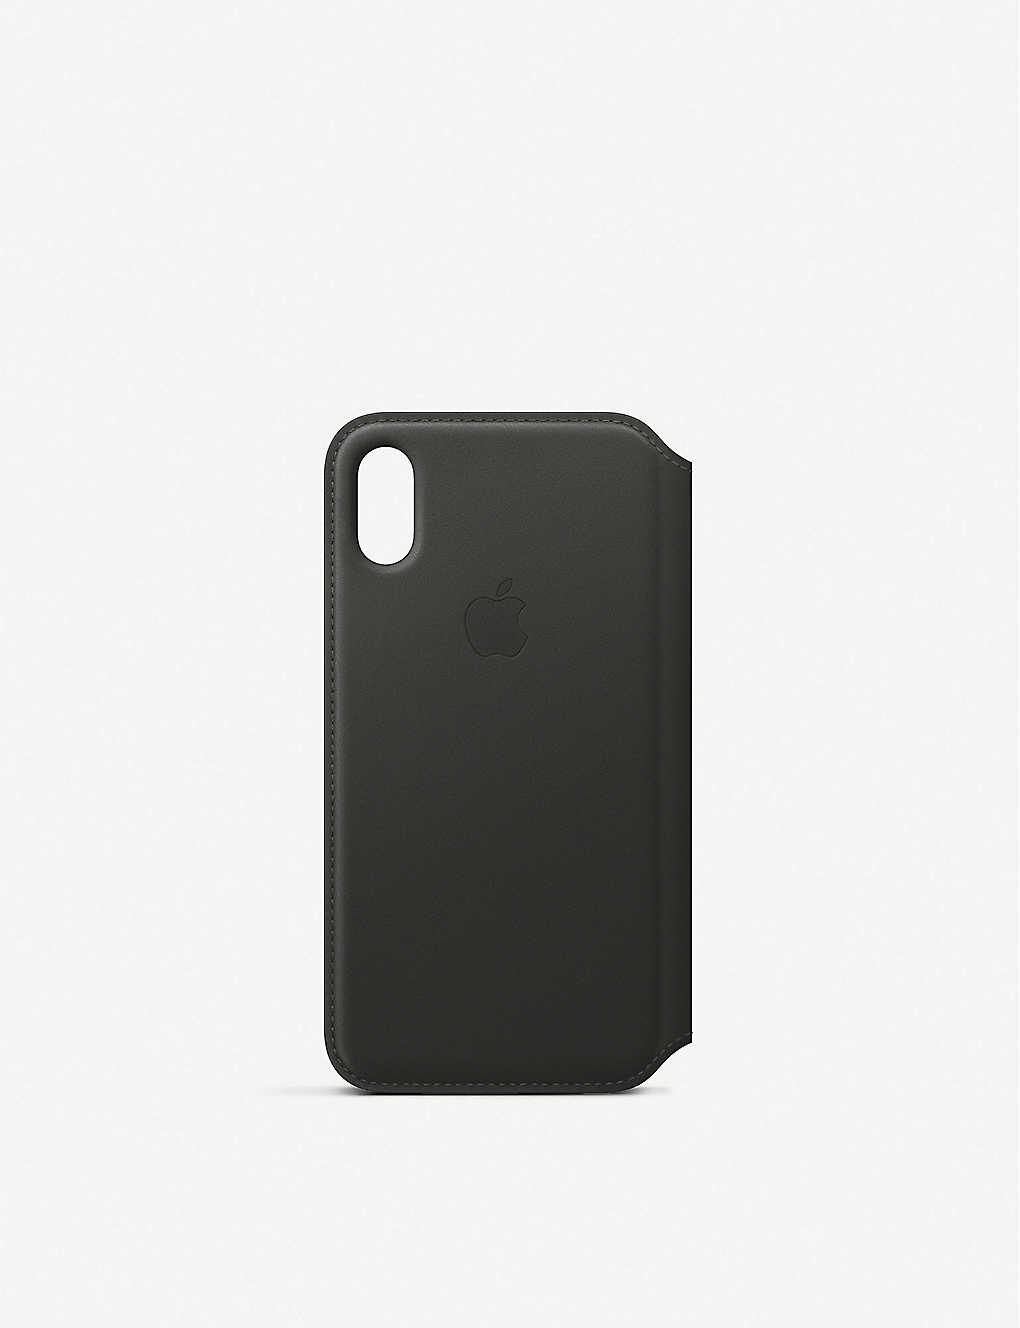 quality design f5b55 399af iPhone XS Leather Folio Case